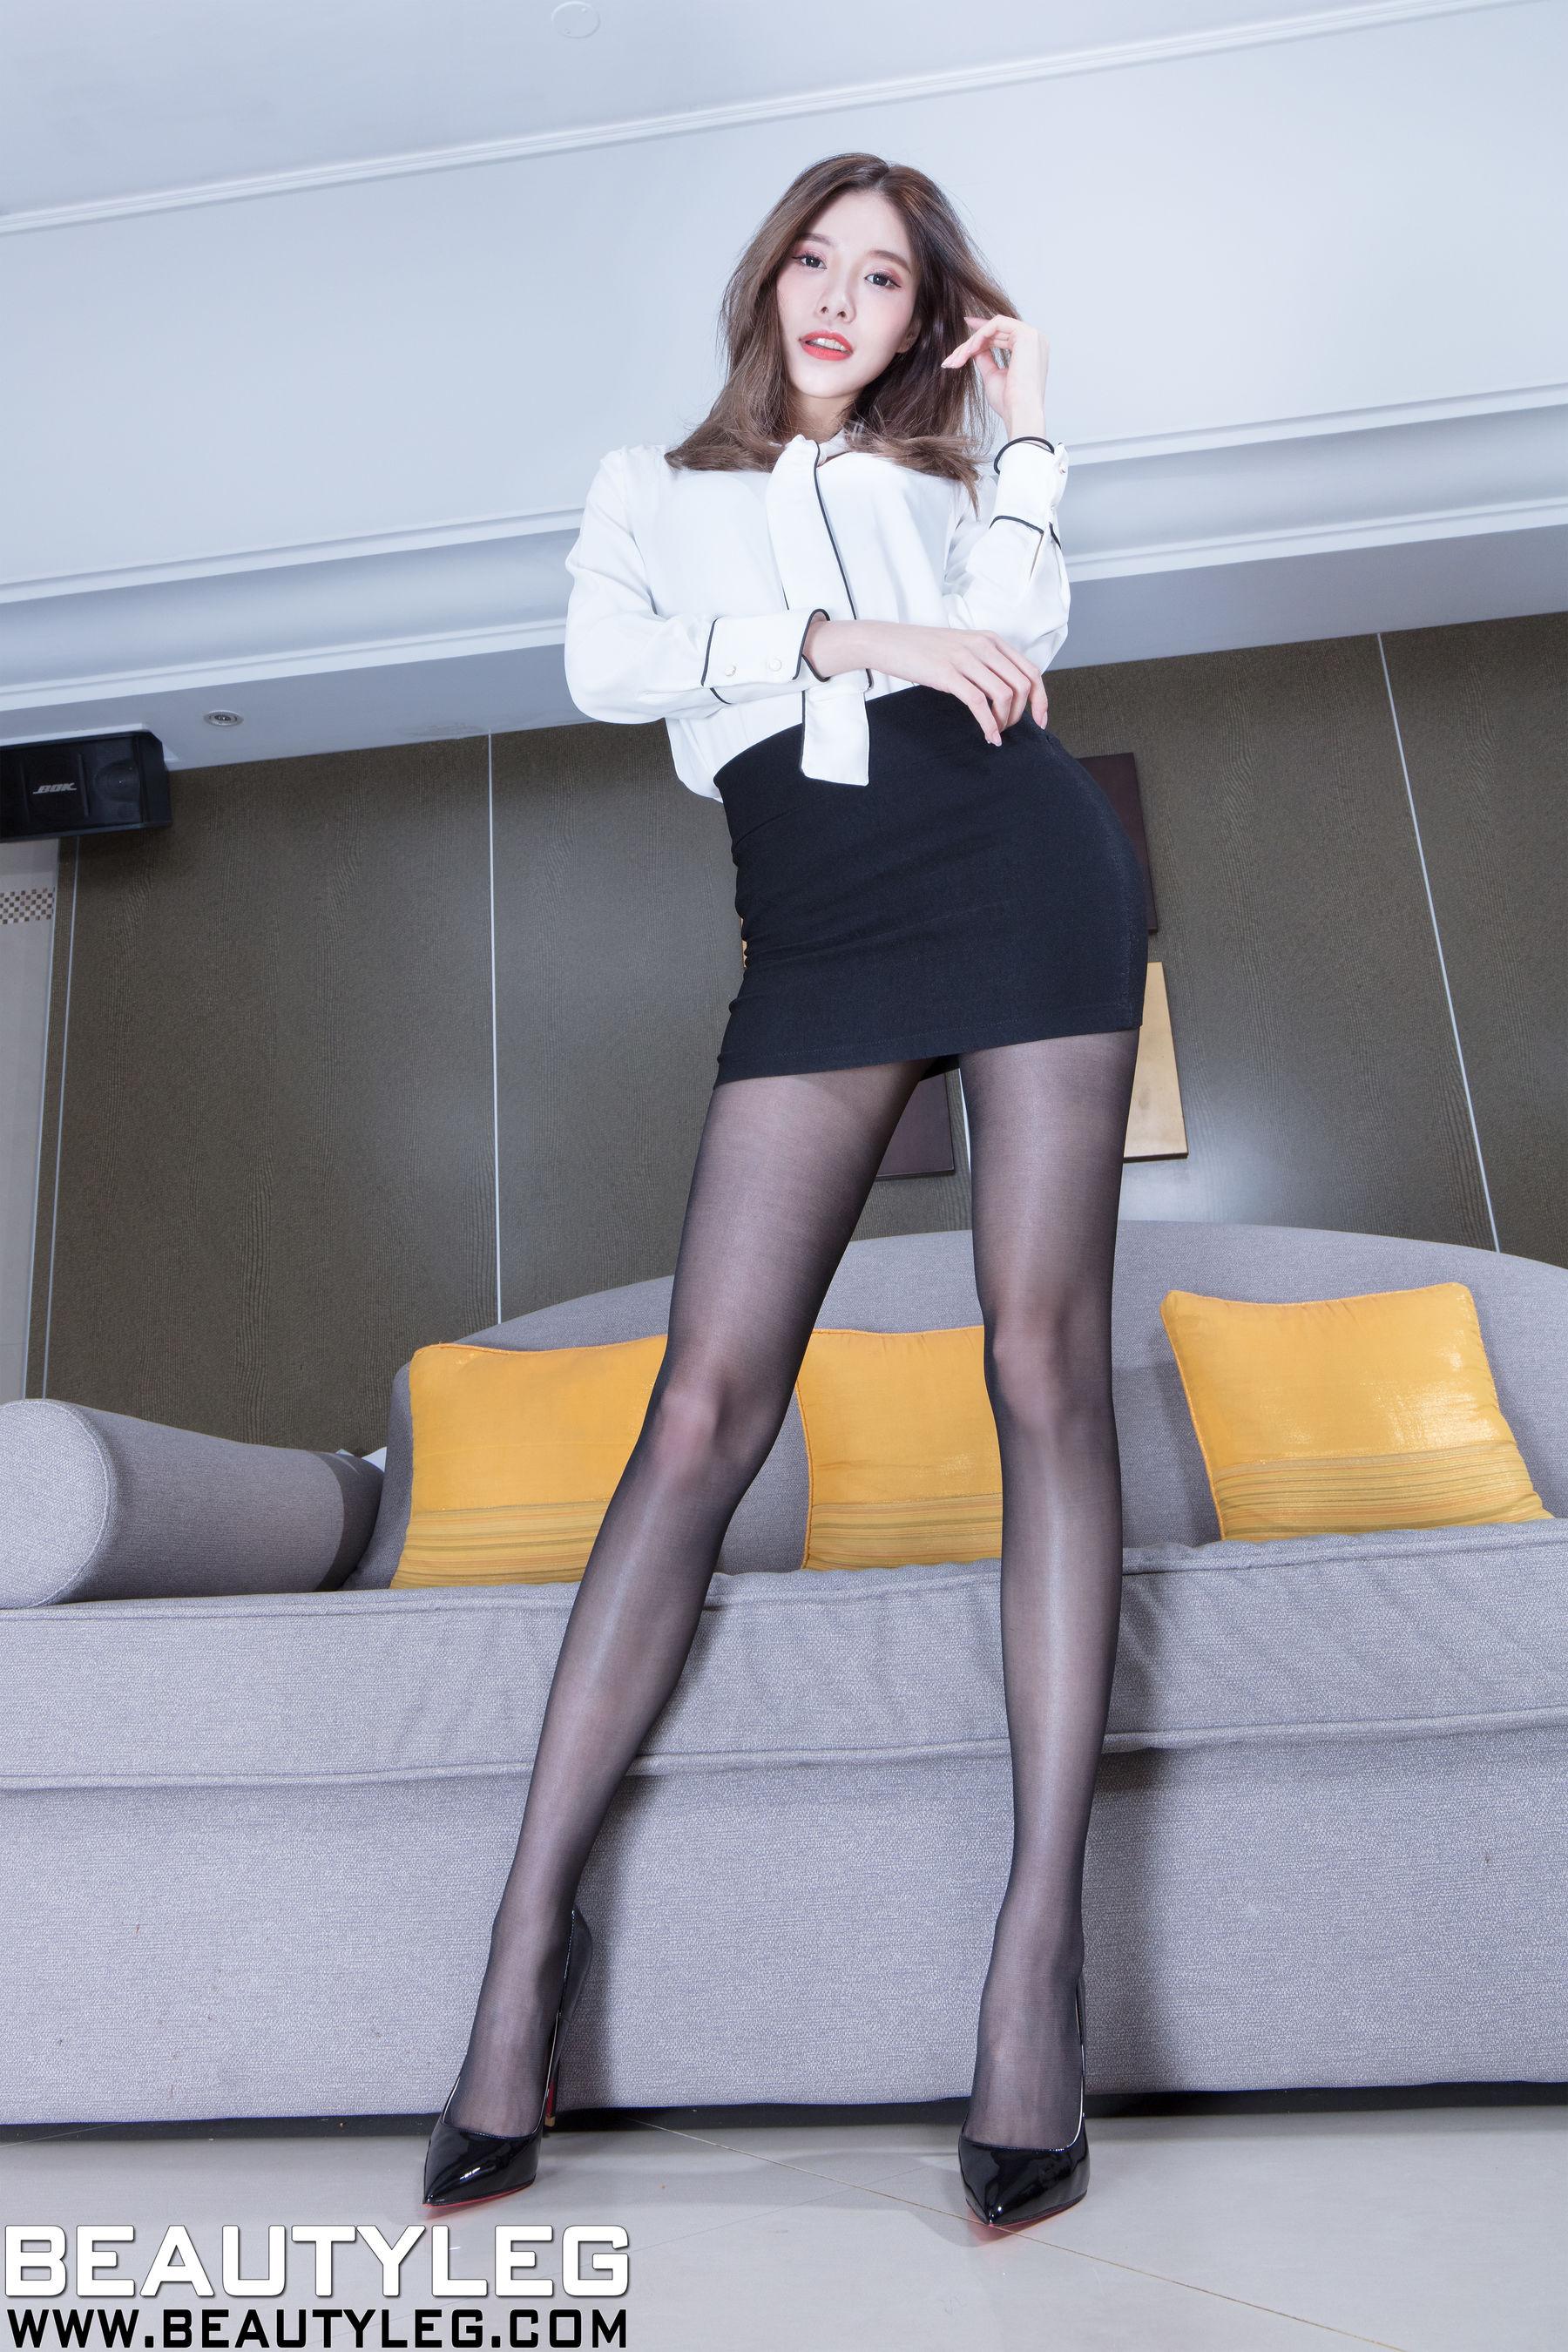 VOL.28 [Beautyleg]旗袍OL美女高跟美腿:陈玉雪(腿模Abby)超高清个人性感漂亮大图(46P)